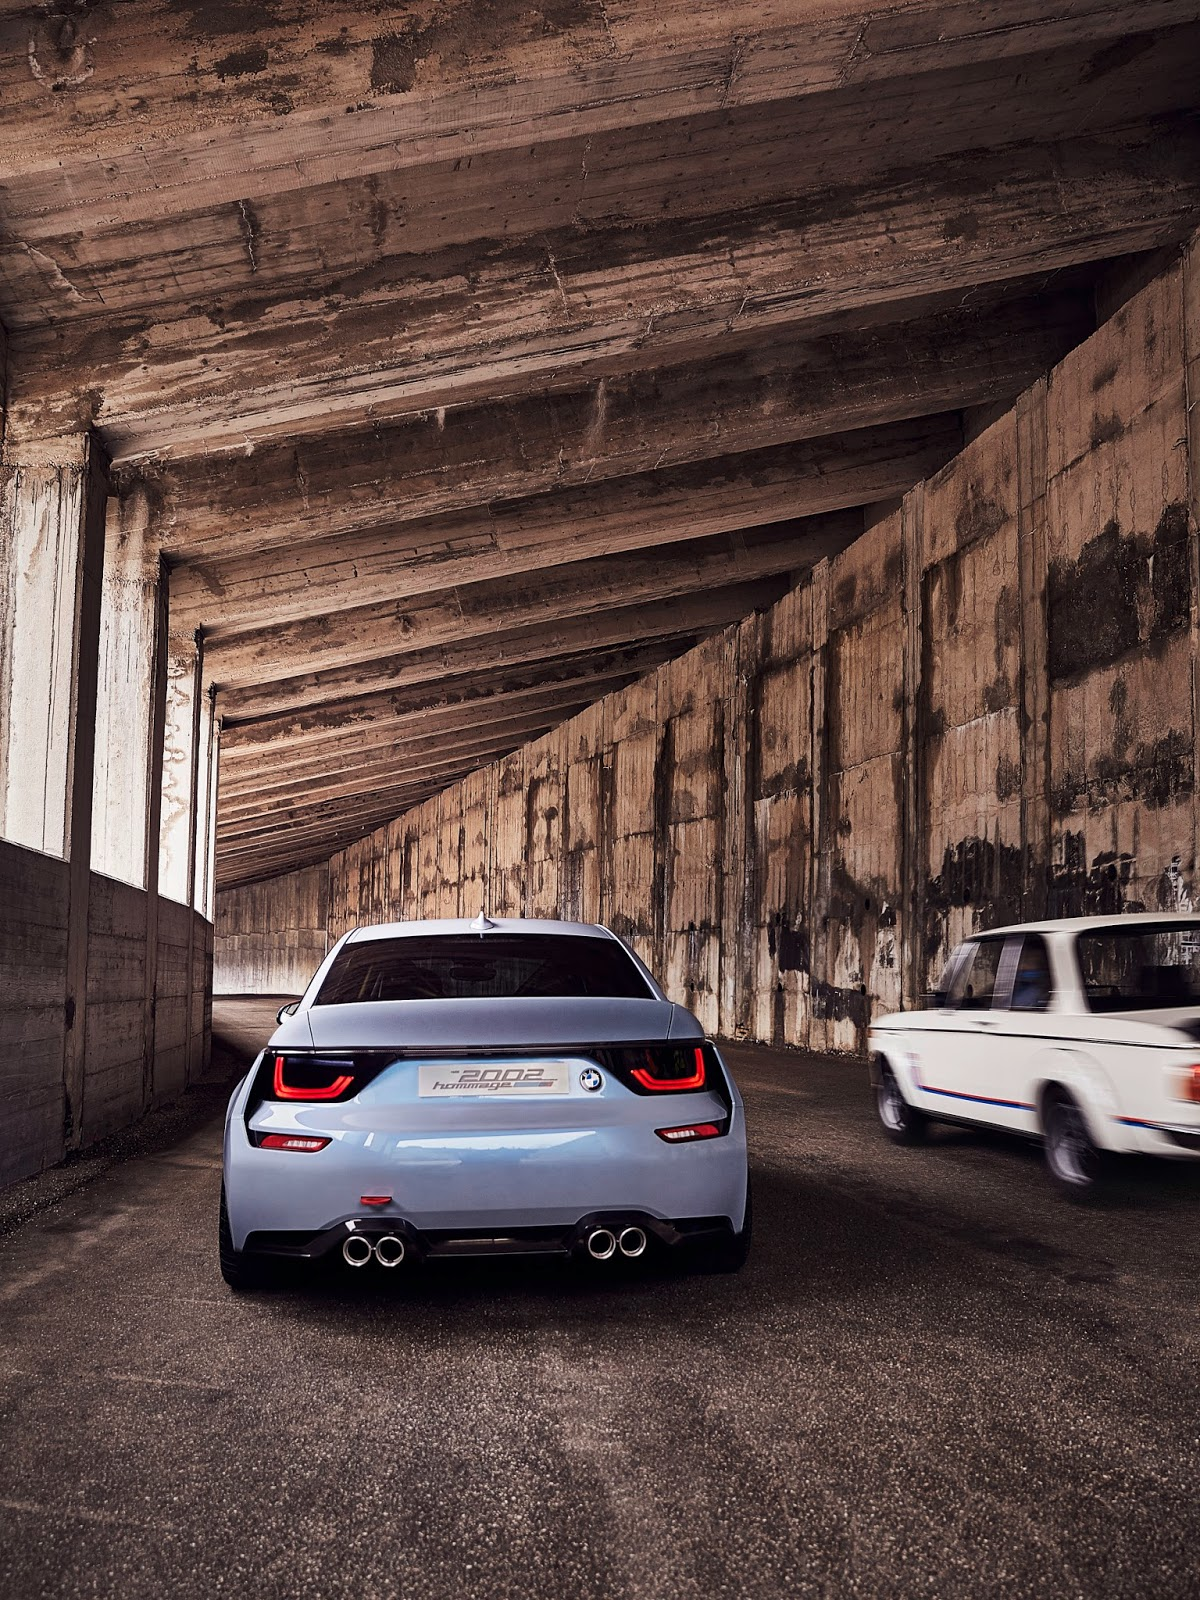 P90219718 highRes bmw 2002 hommage 05 1 1 H BMW γιορτάζει τα 50 χρόνια της θρυλικής 2002 turbo και παρουσιάζει την Bmw 2002 Hommage BMW, BMW 2002, BMW 2002 turbo, BMW Concept, BMW Hommage, supercars, videos